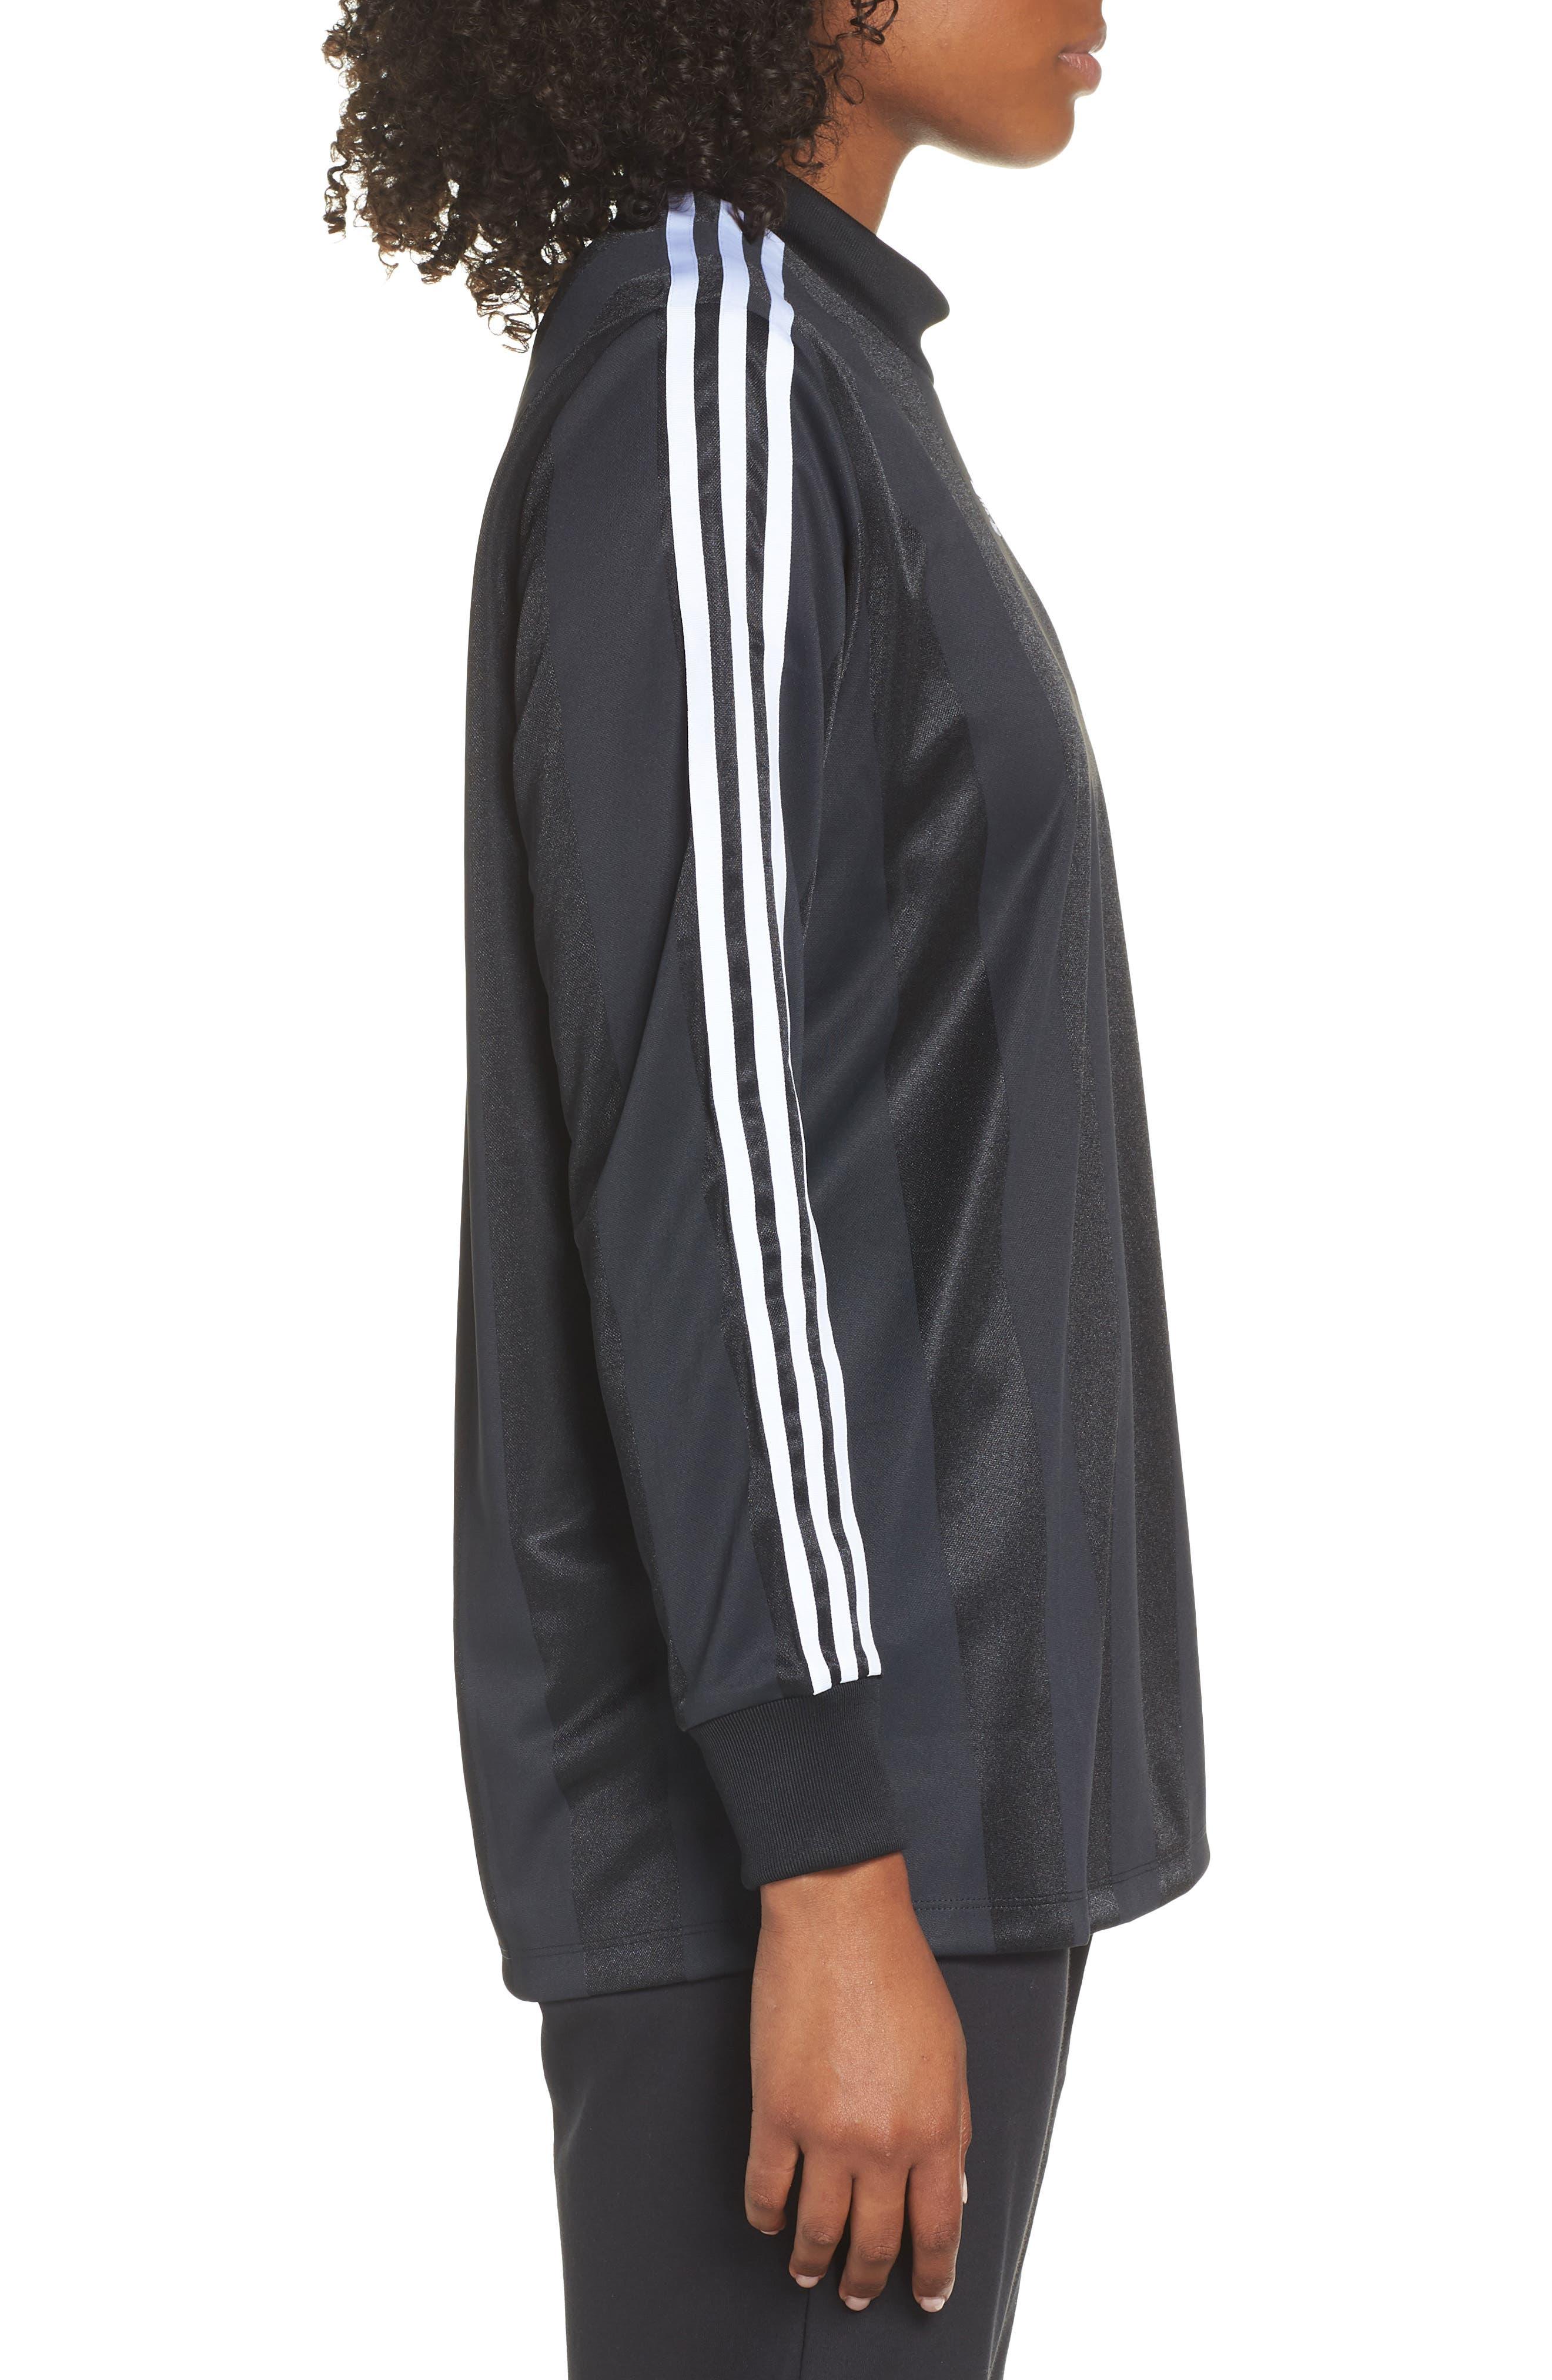 adidas 3-Stripes Long Sleeve Tee,                             Alternate thumbnail 3, color,                             001